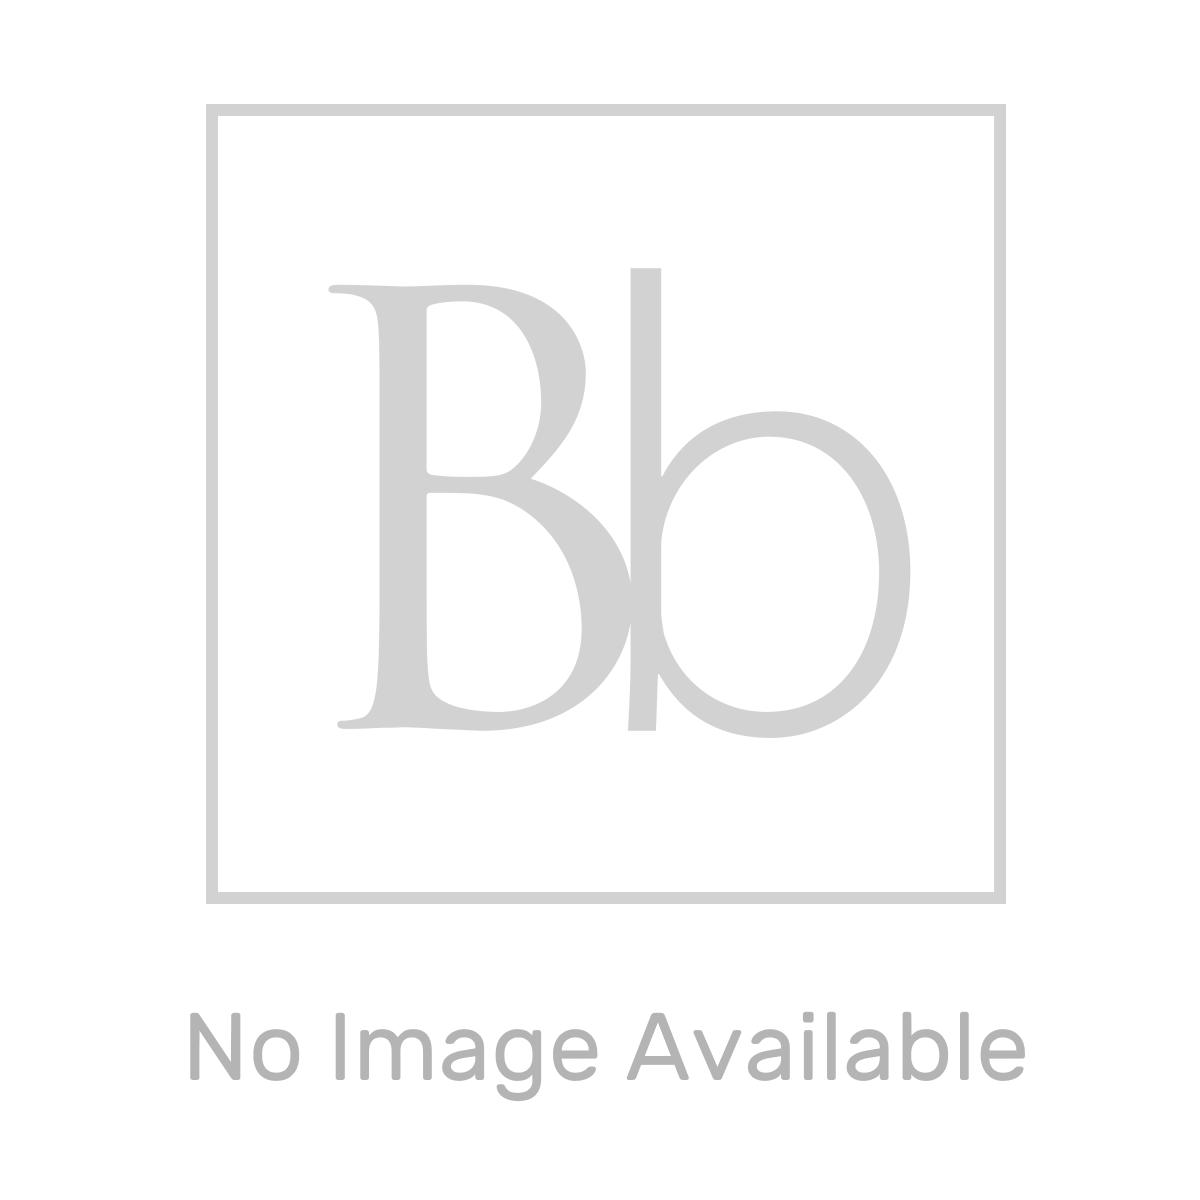 RAK Washington Grey Vanity Unit with Black Countertop 1200mm